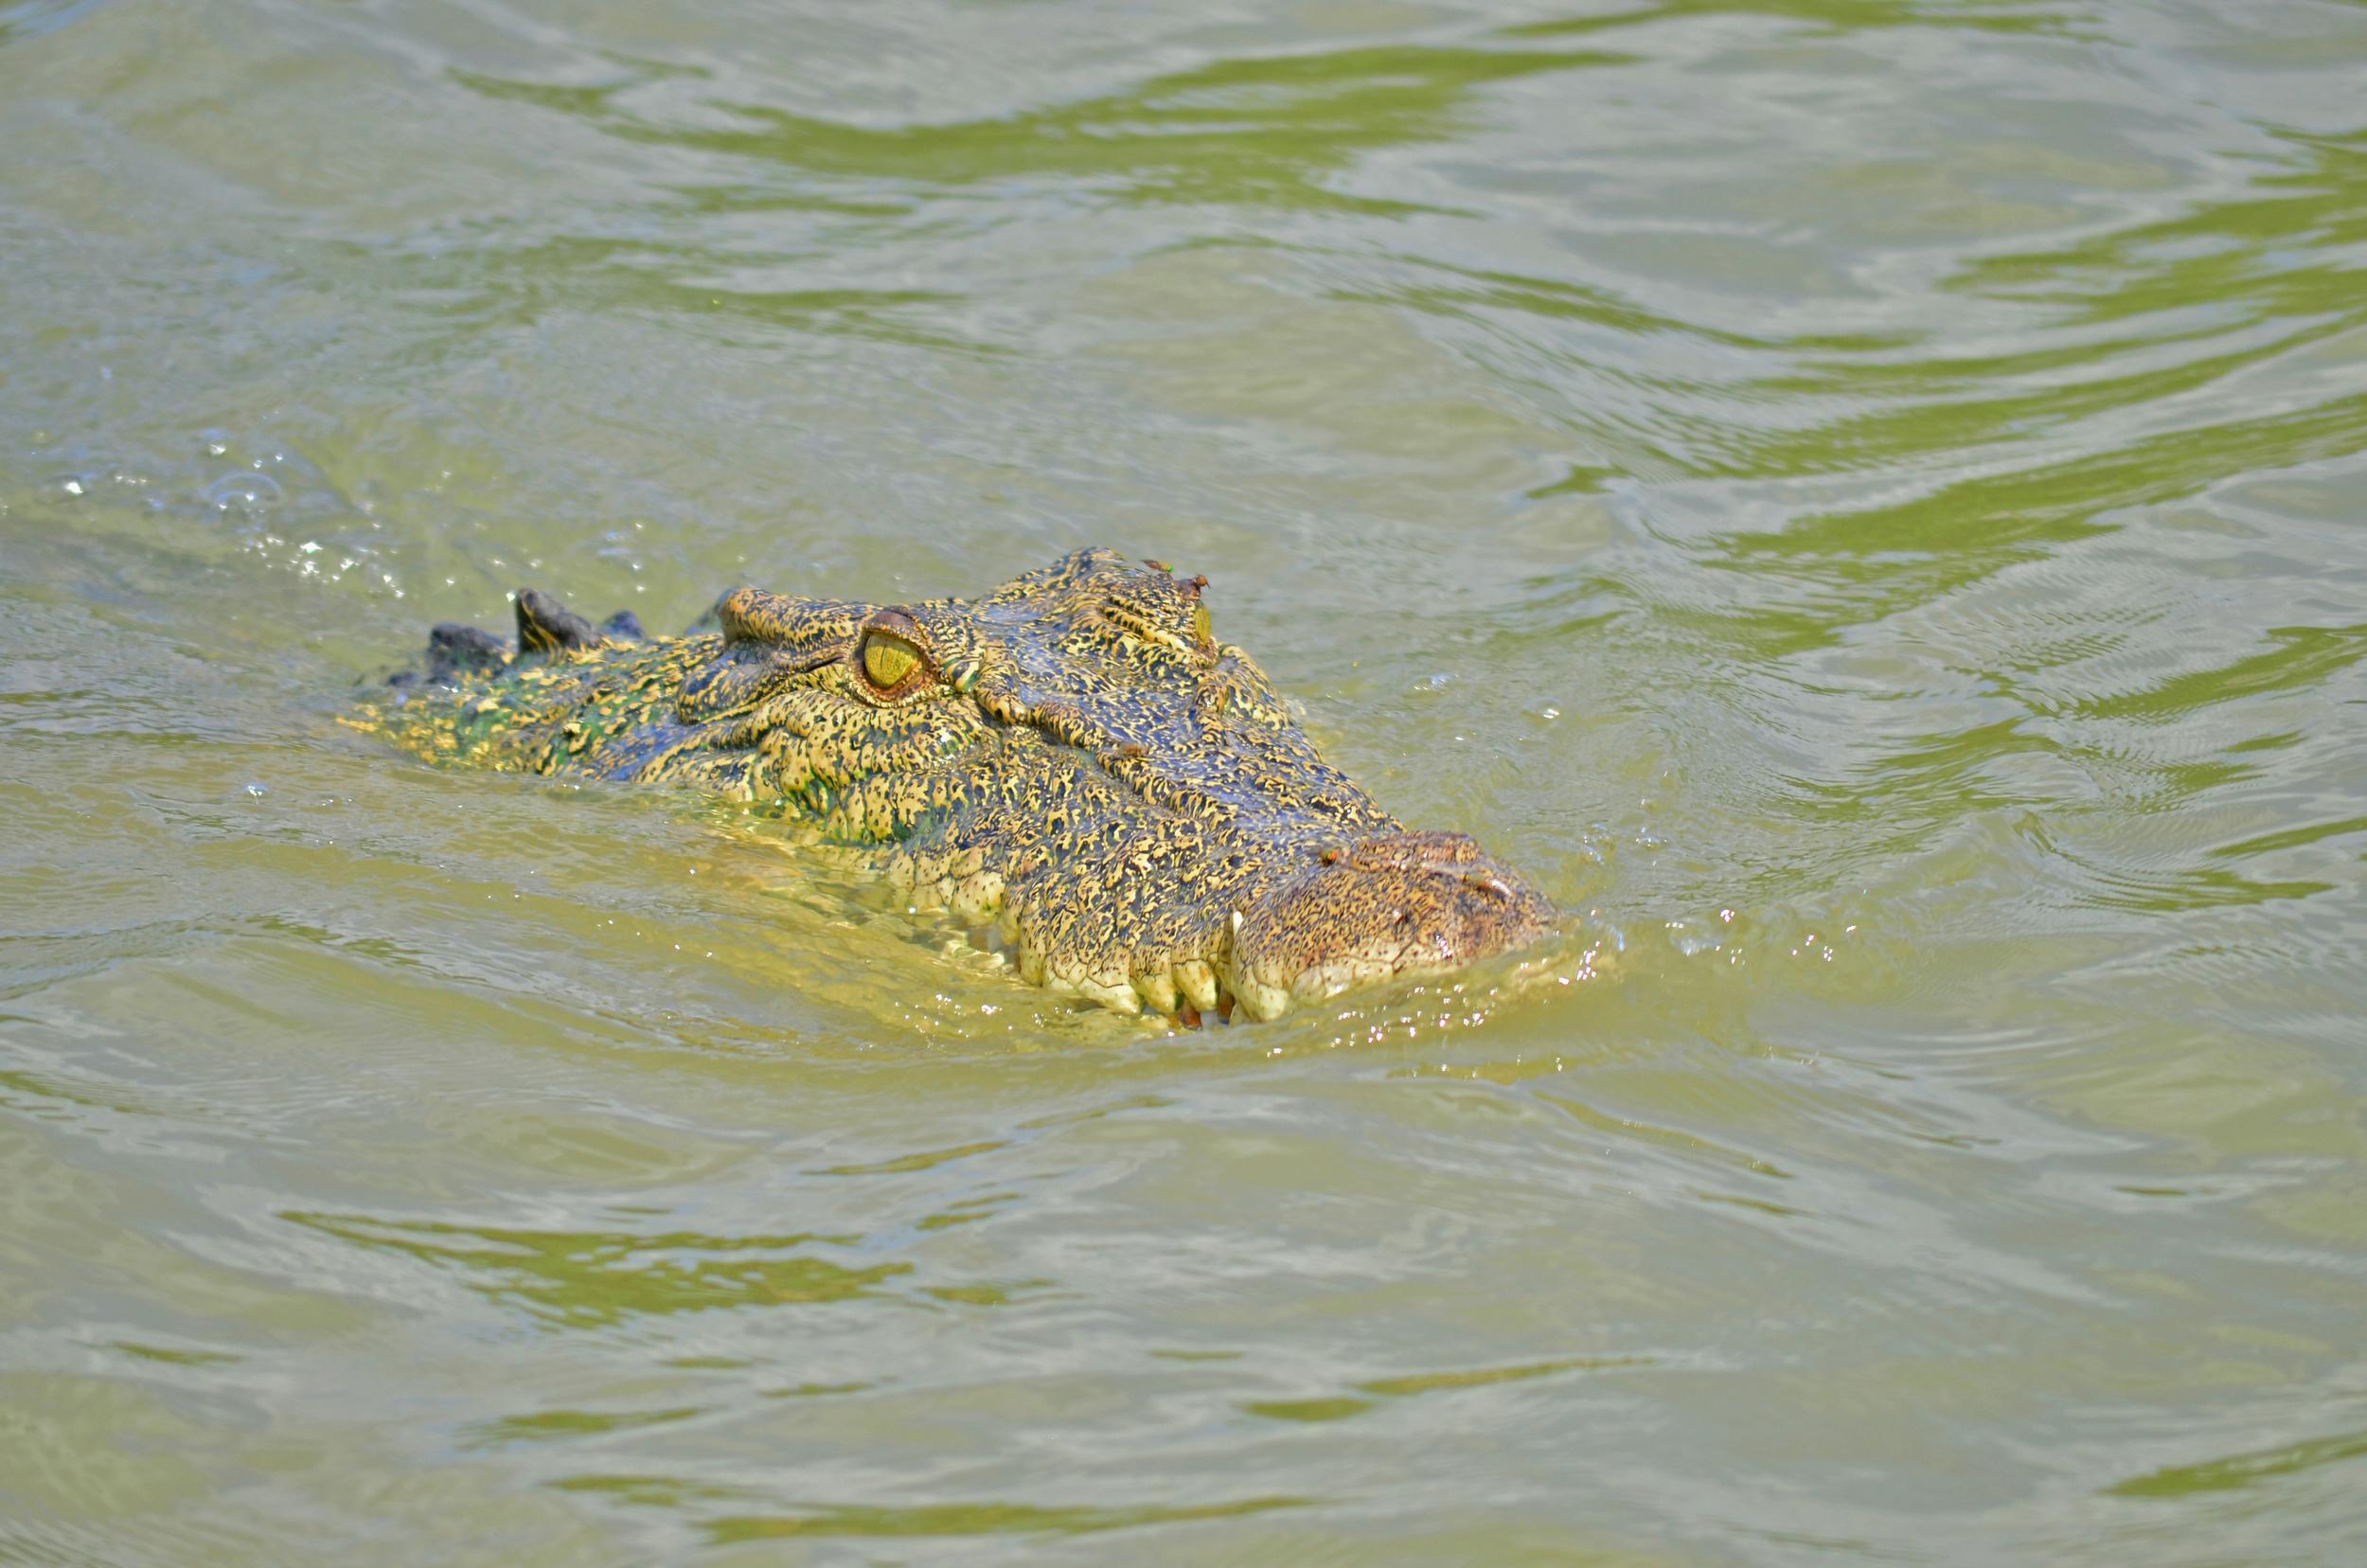 [4] The Crocodile of Kakadu, Northern Territory.